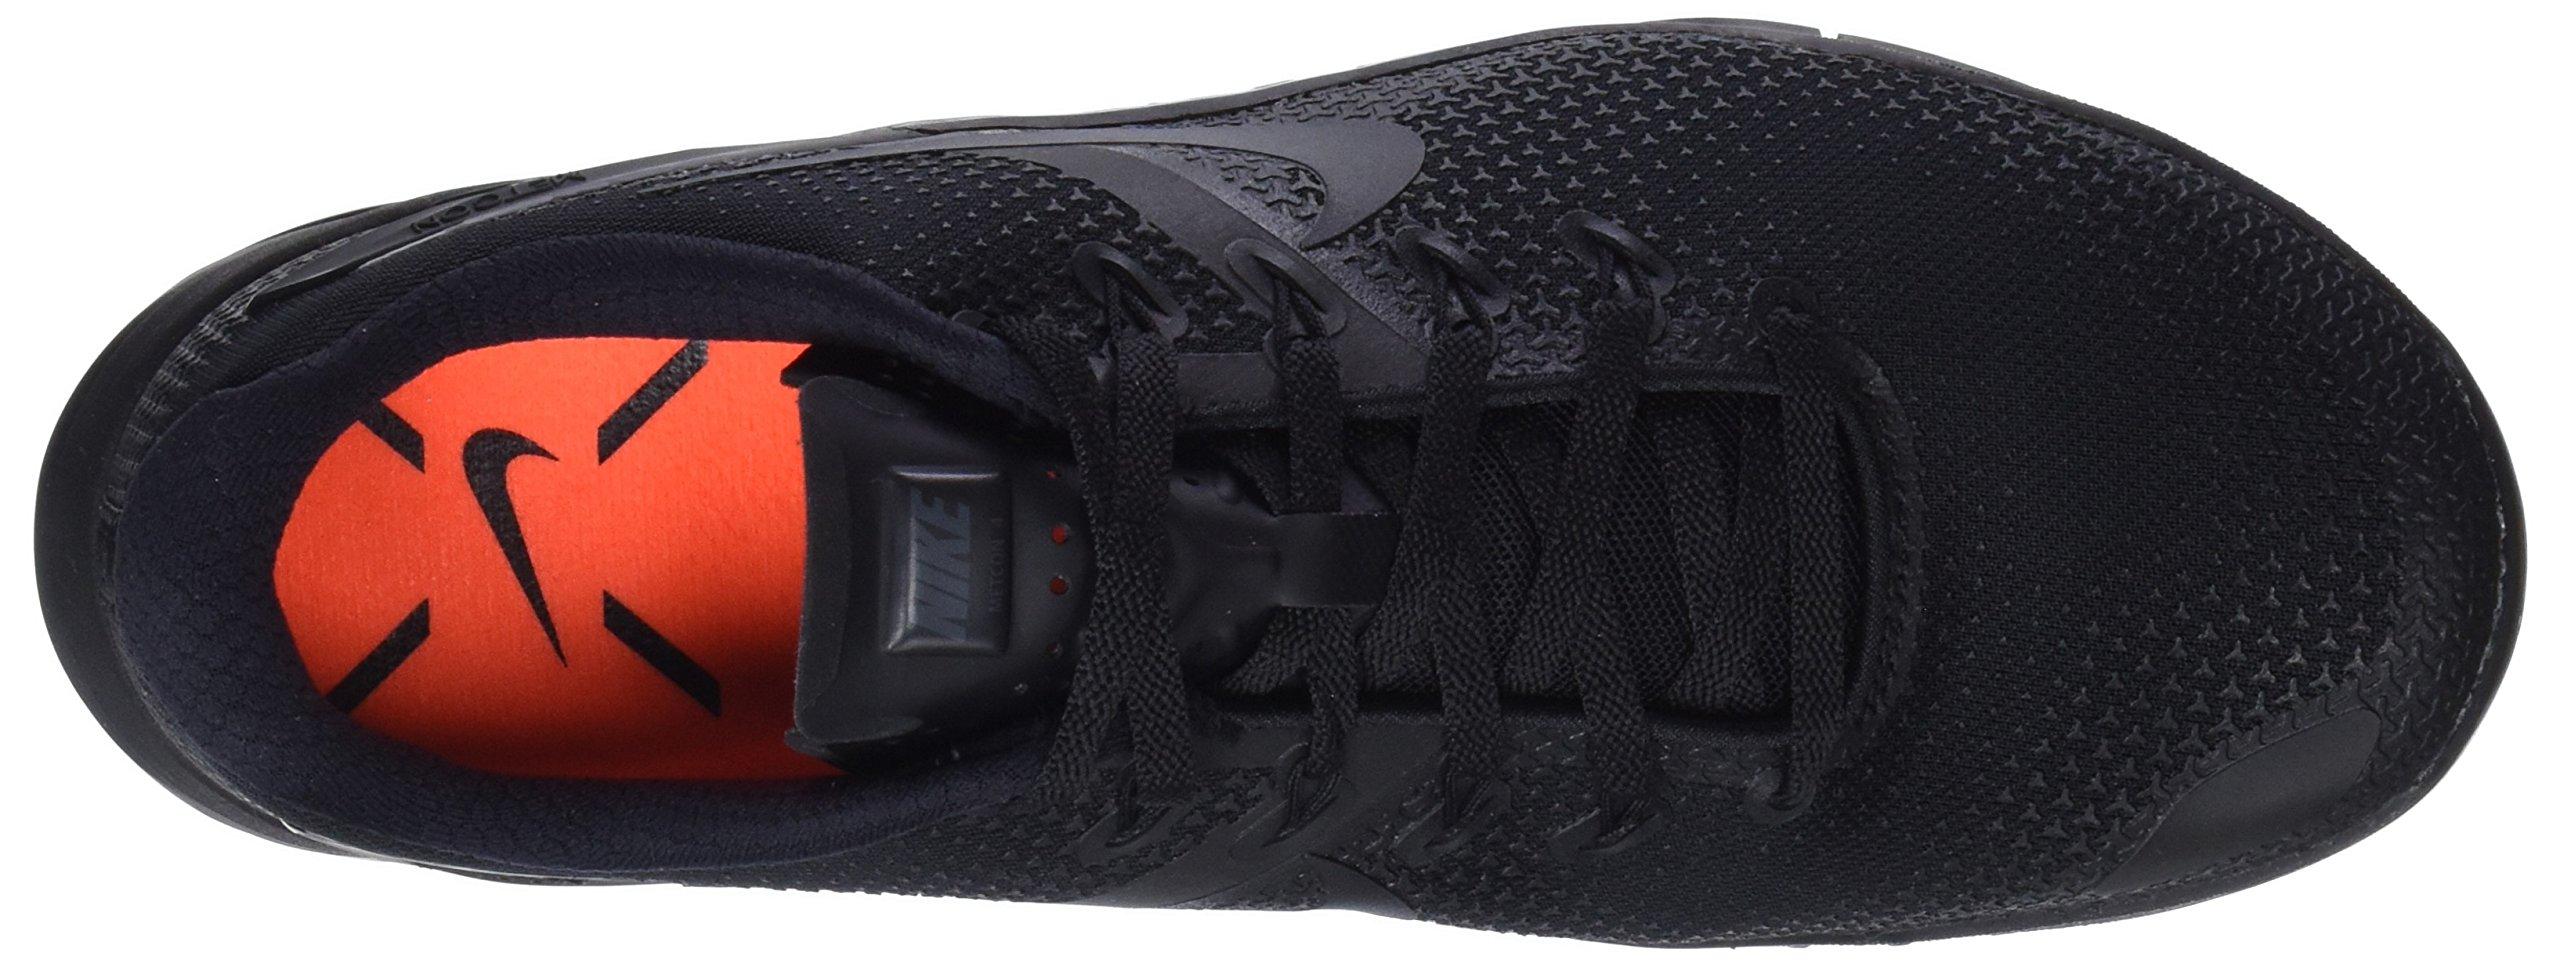 Nike Men's Metcon 4 Training Shoe Black/Black-Black-Hyper Crimson 7.5 by Nike (Image #7)